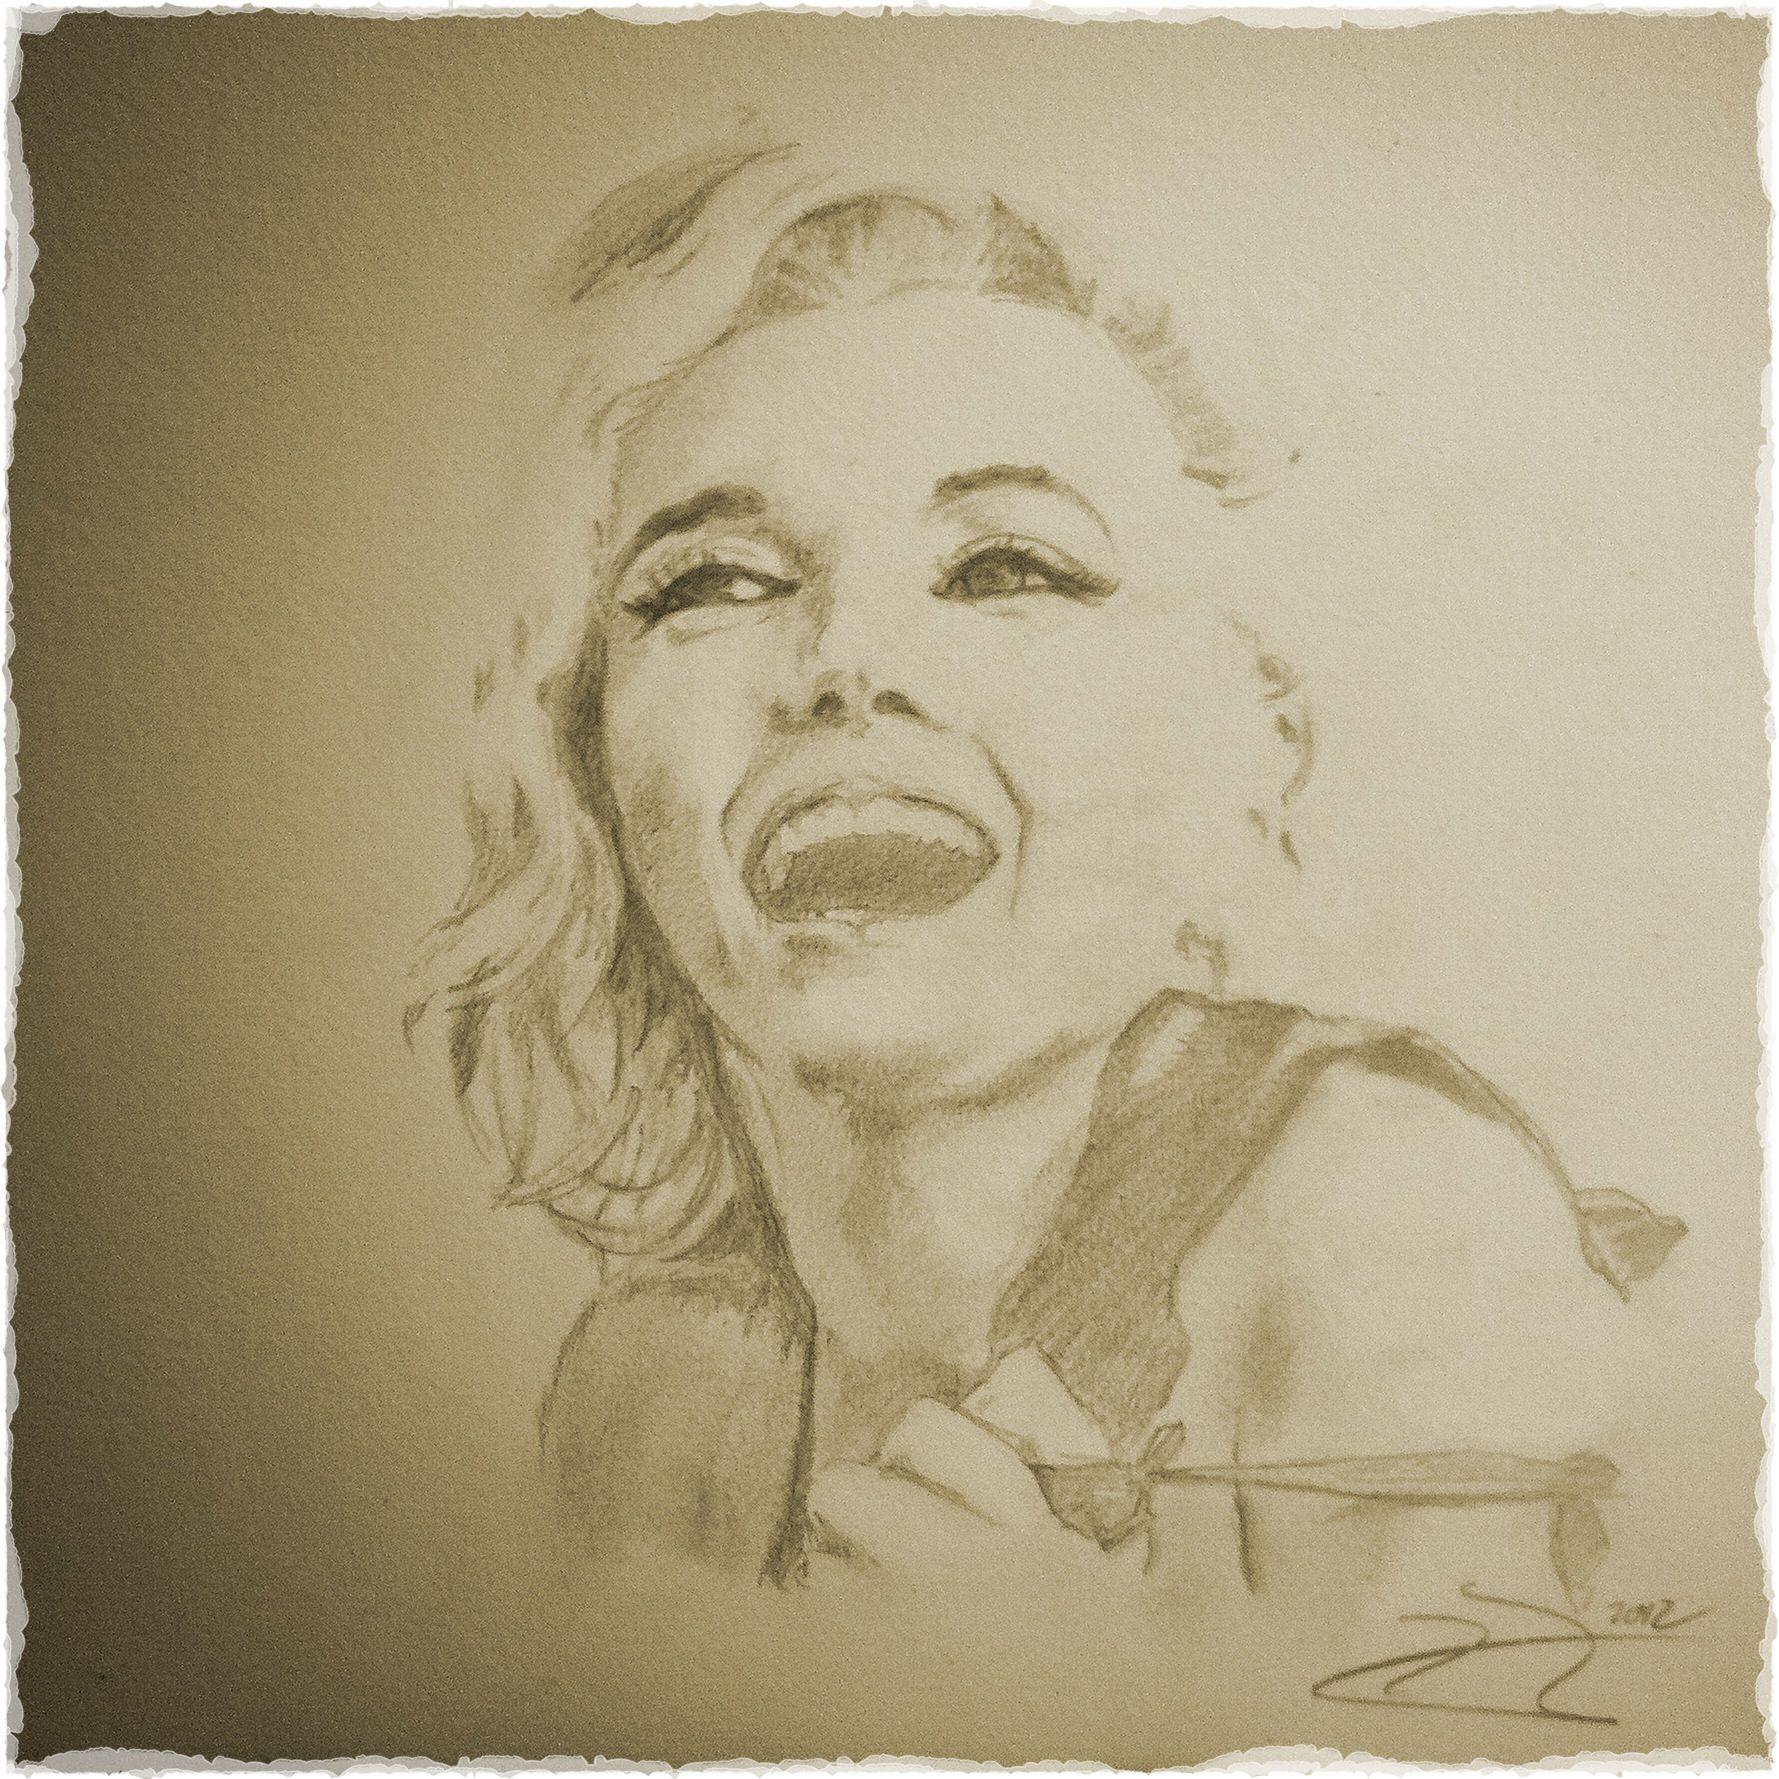 Marilyn Monroe portrait by David Juárez